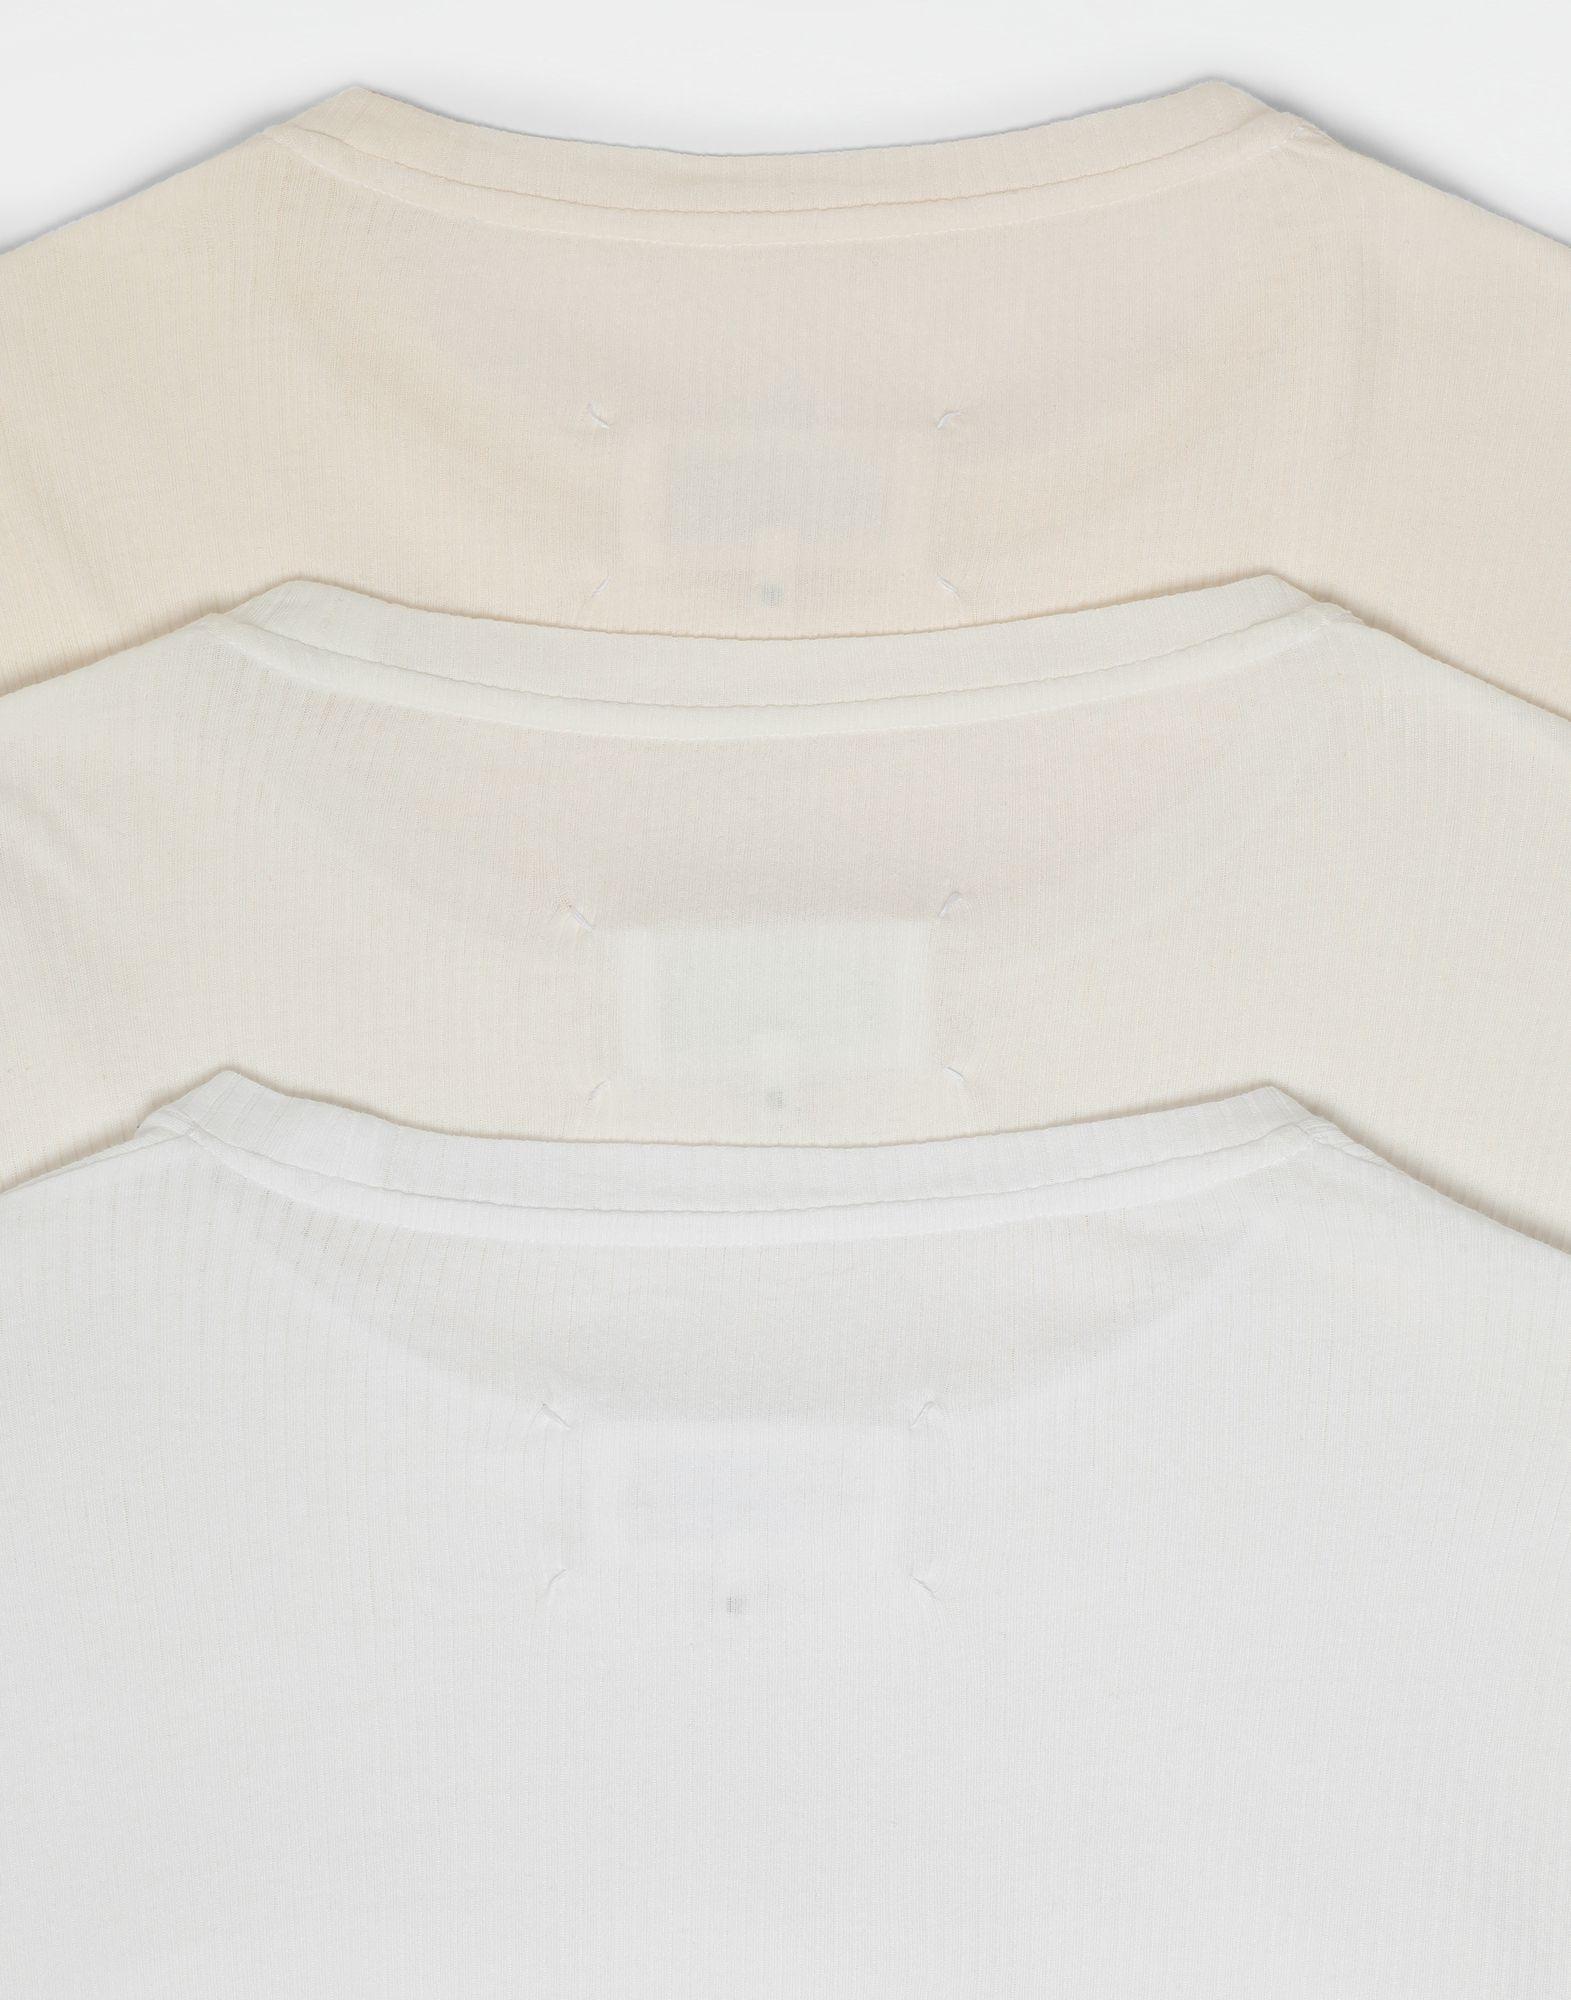 MAISON MARGIELA 3-pack Stereotype white T-shirts Long sleeve t-shirt Man a